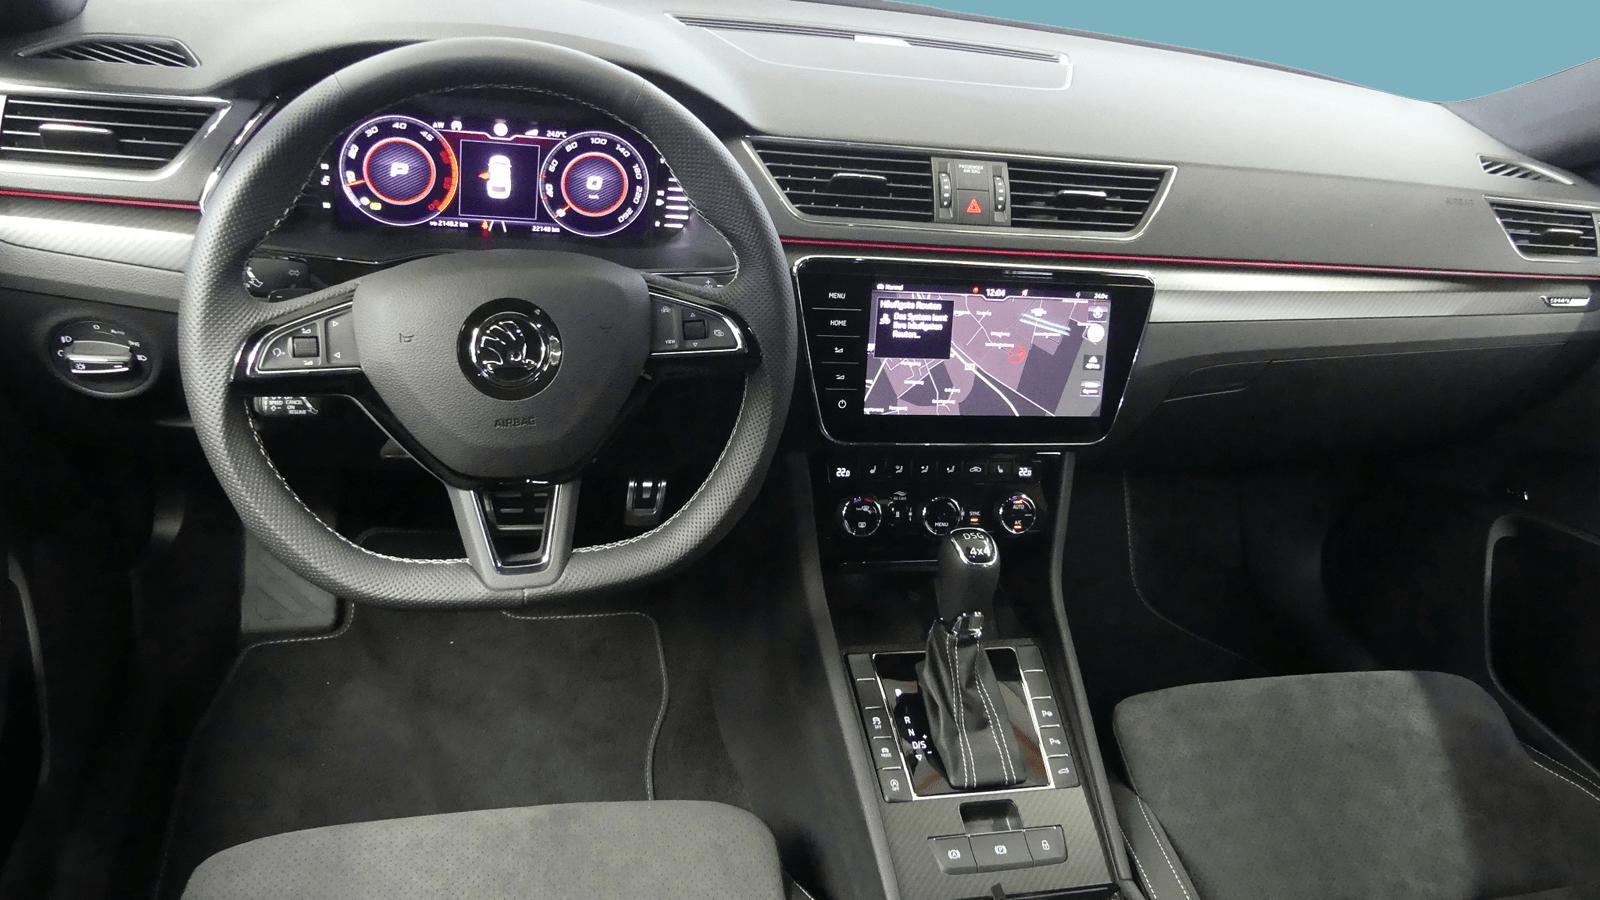 ŠKODA Superb Grau interior - Clyde Auto-Abo